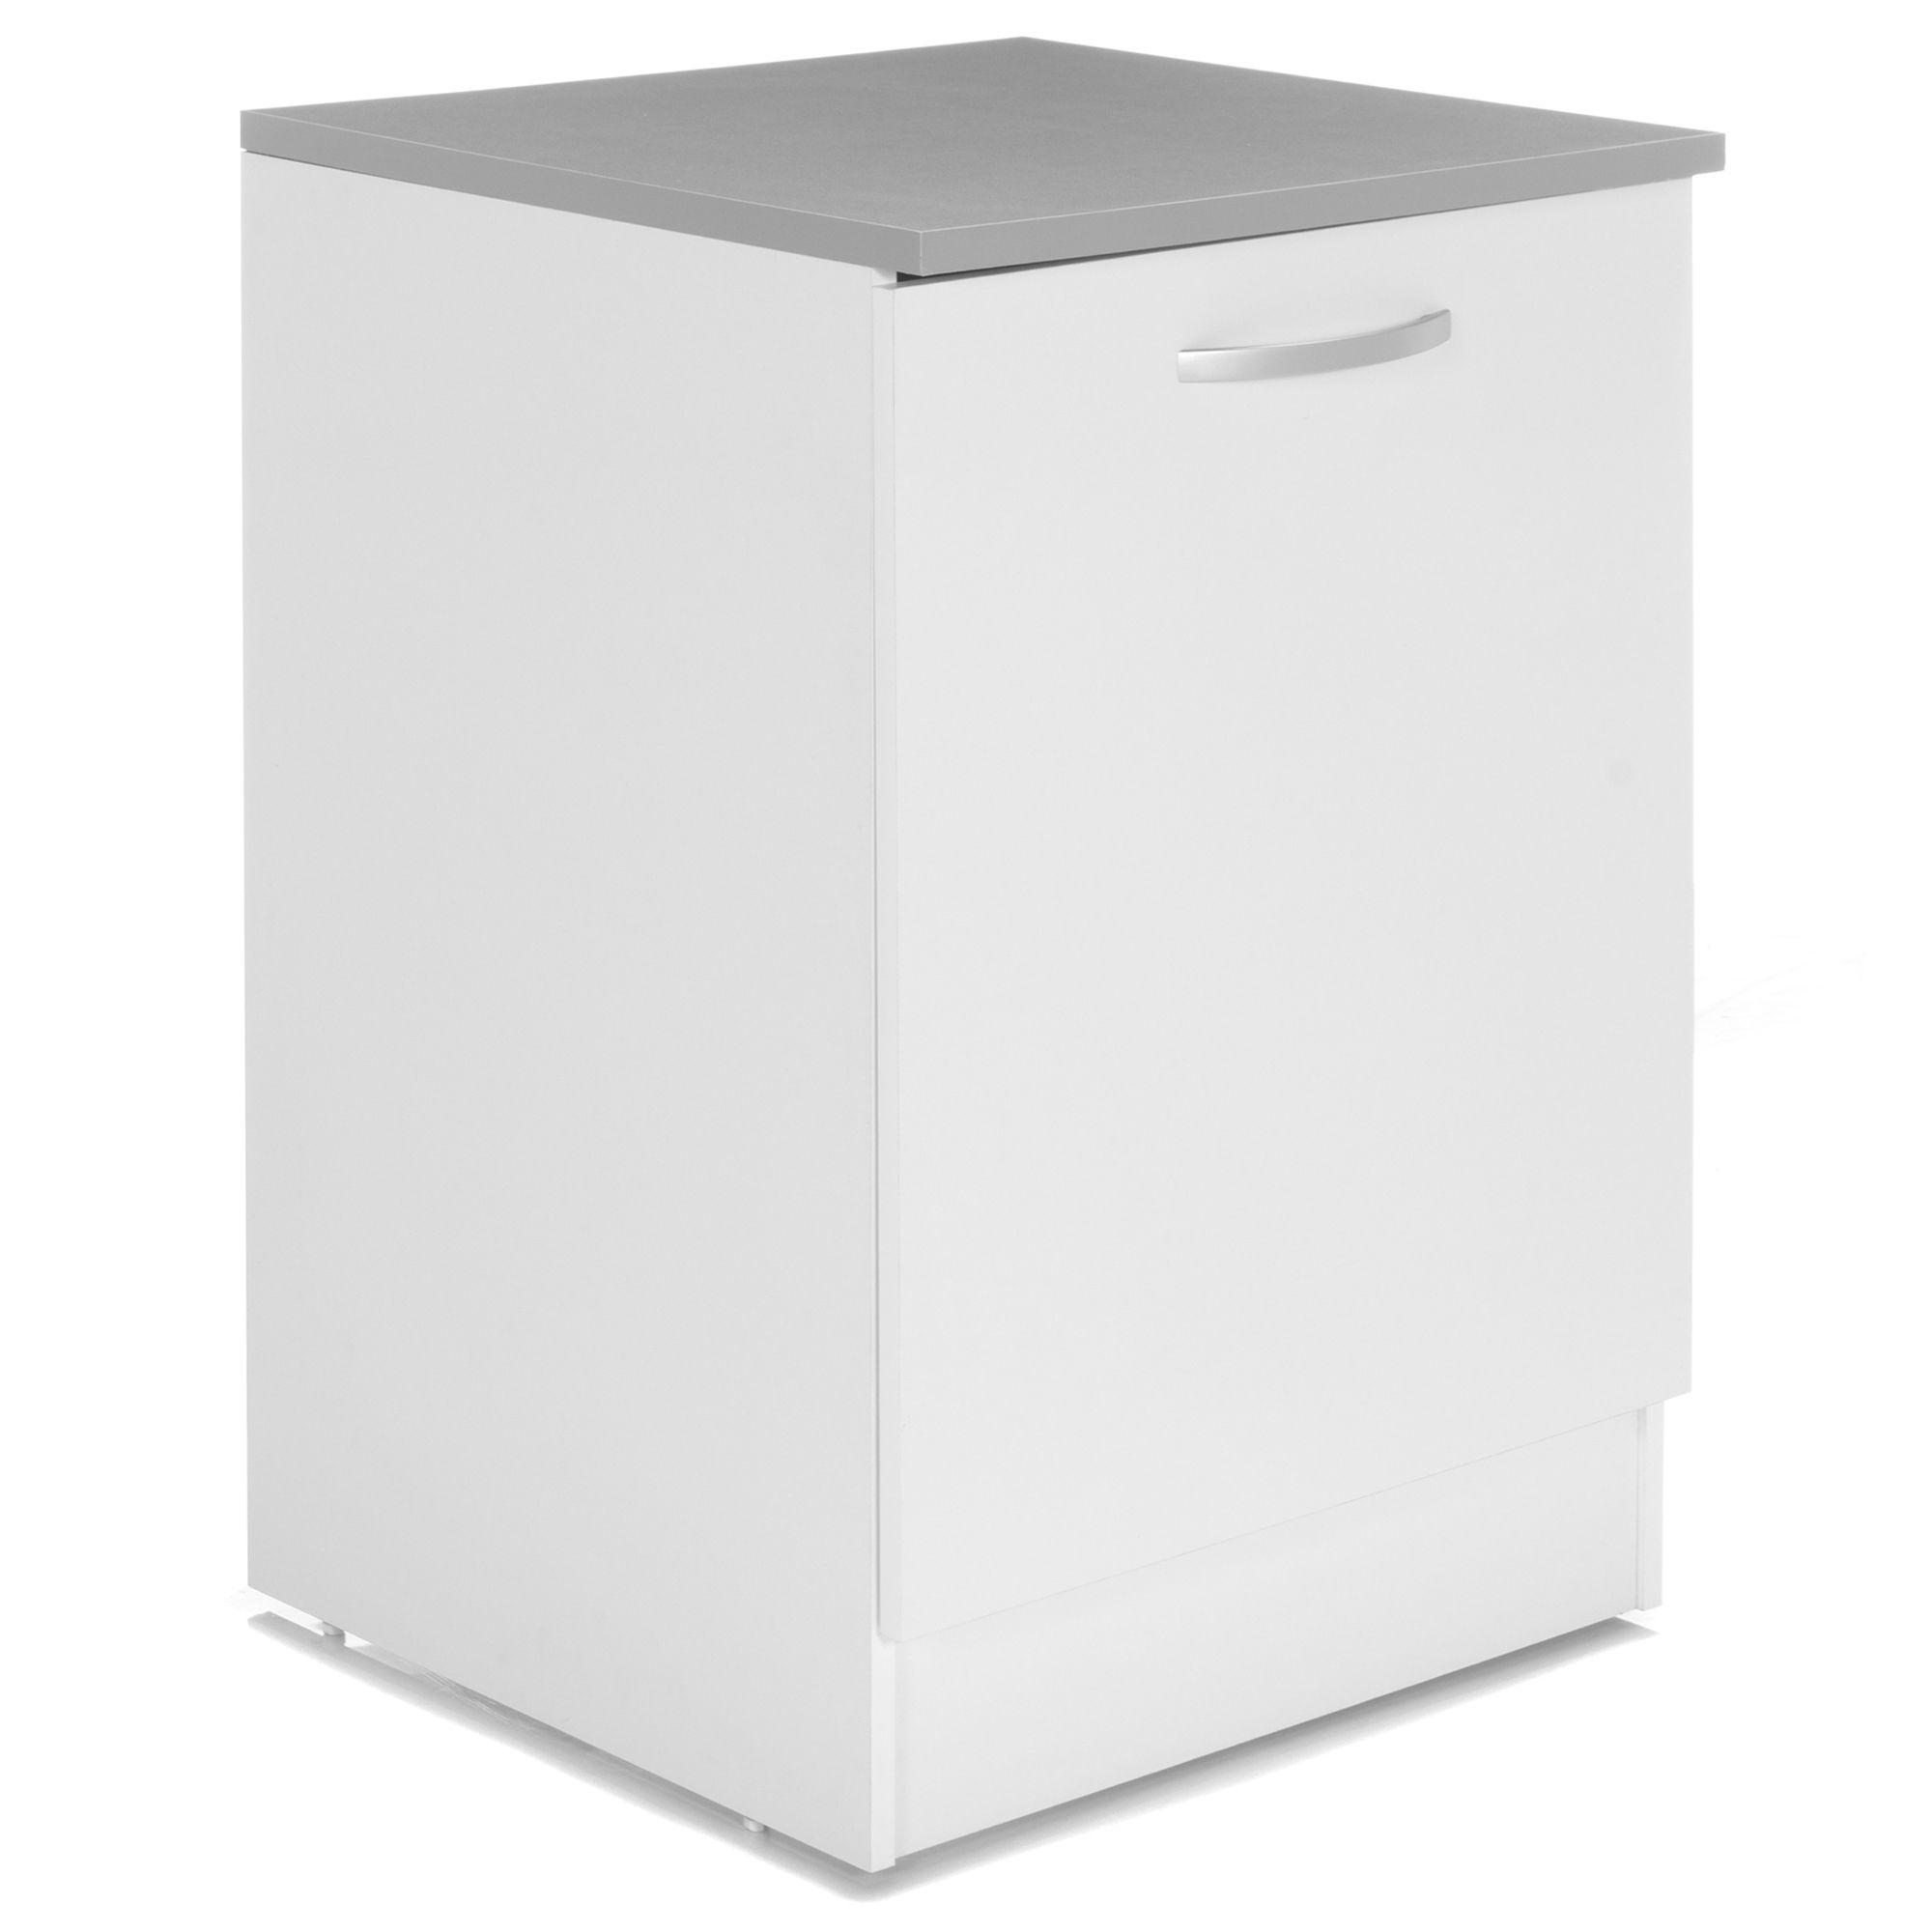 Alinéa - Eko Cuisine Meuble de cuisine bas blanc 1 porte 60cm